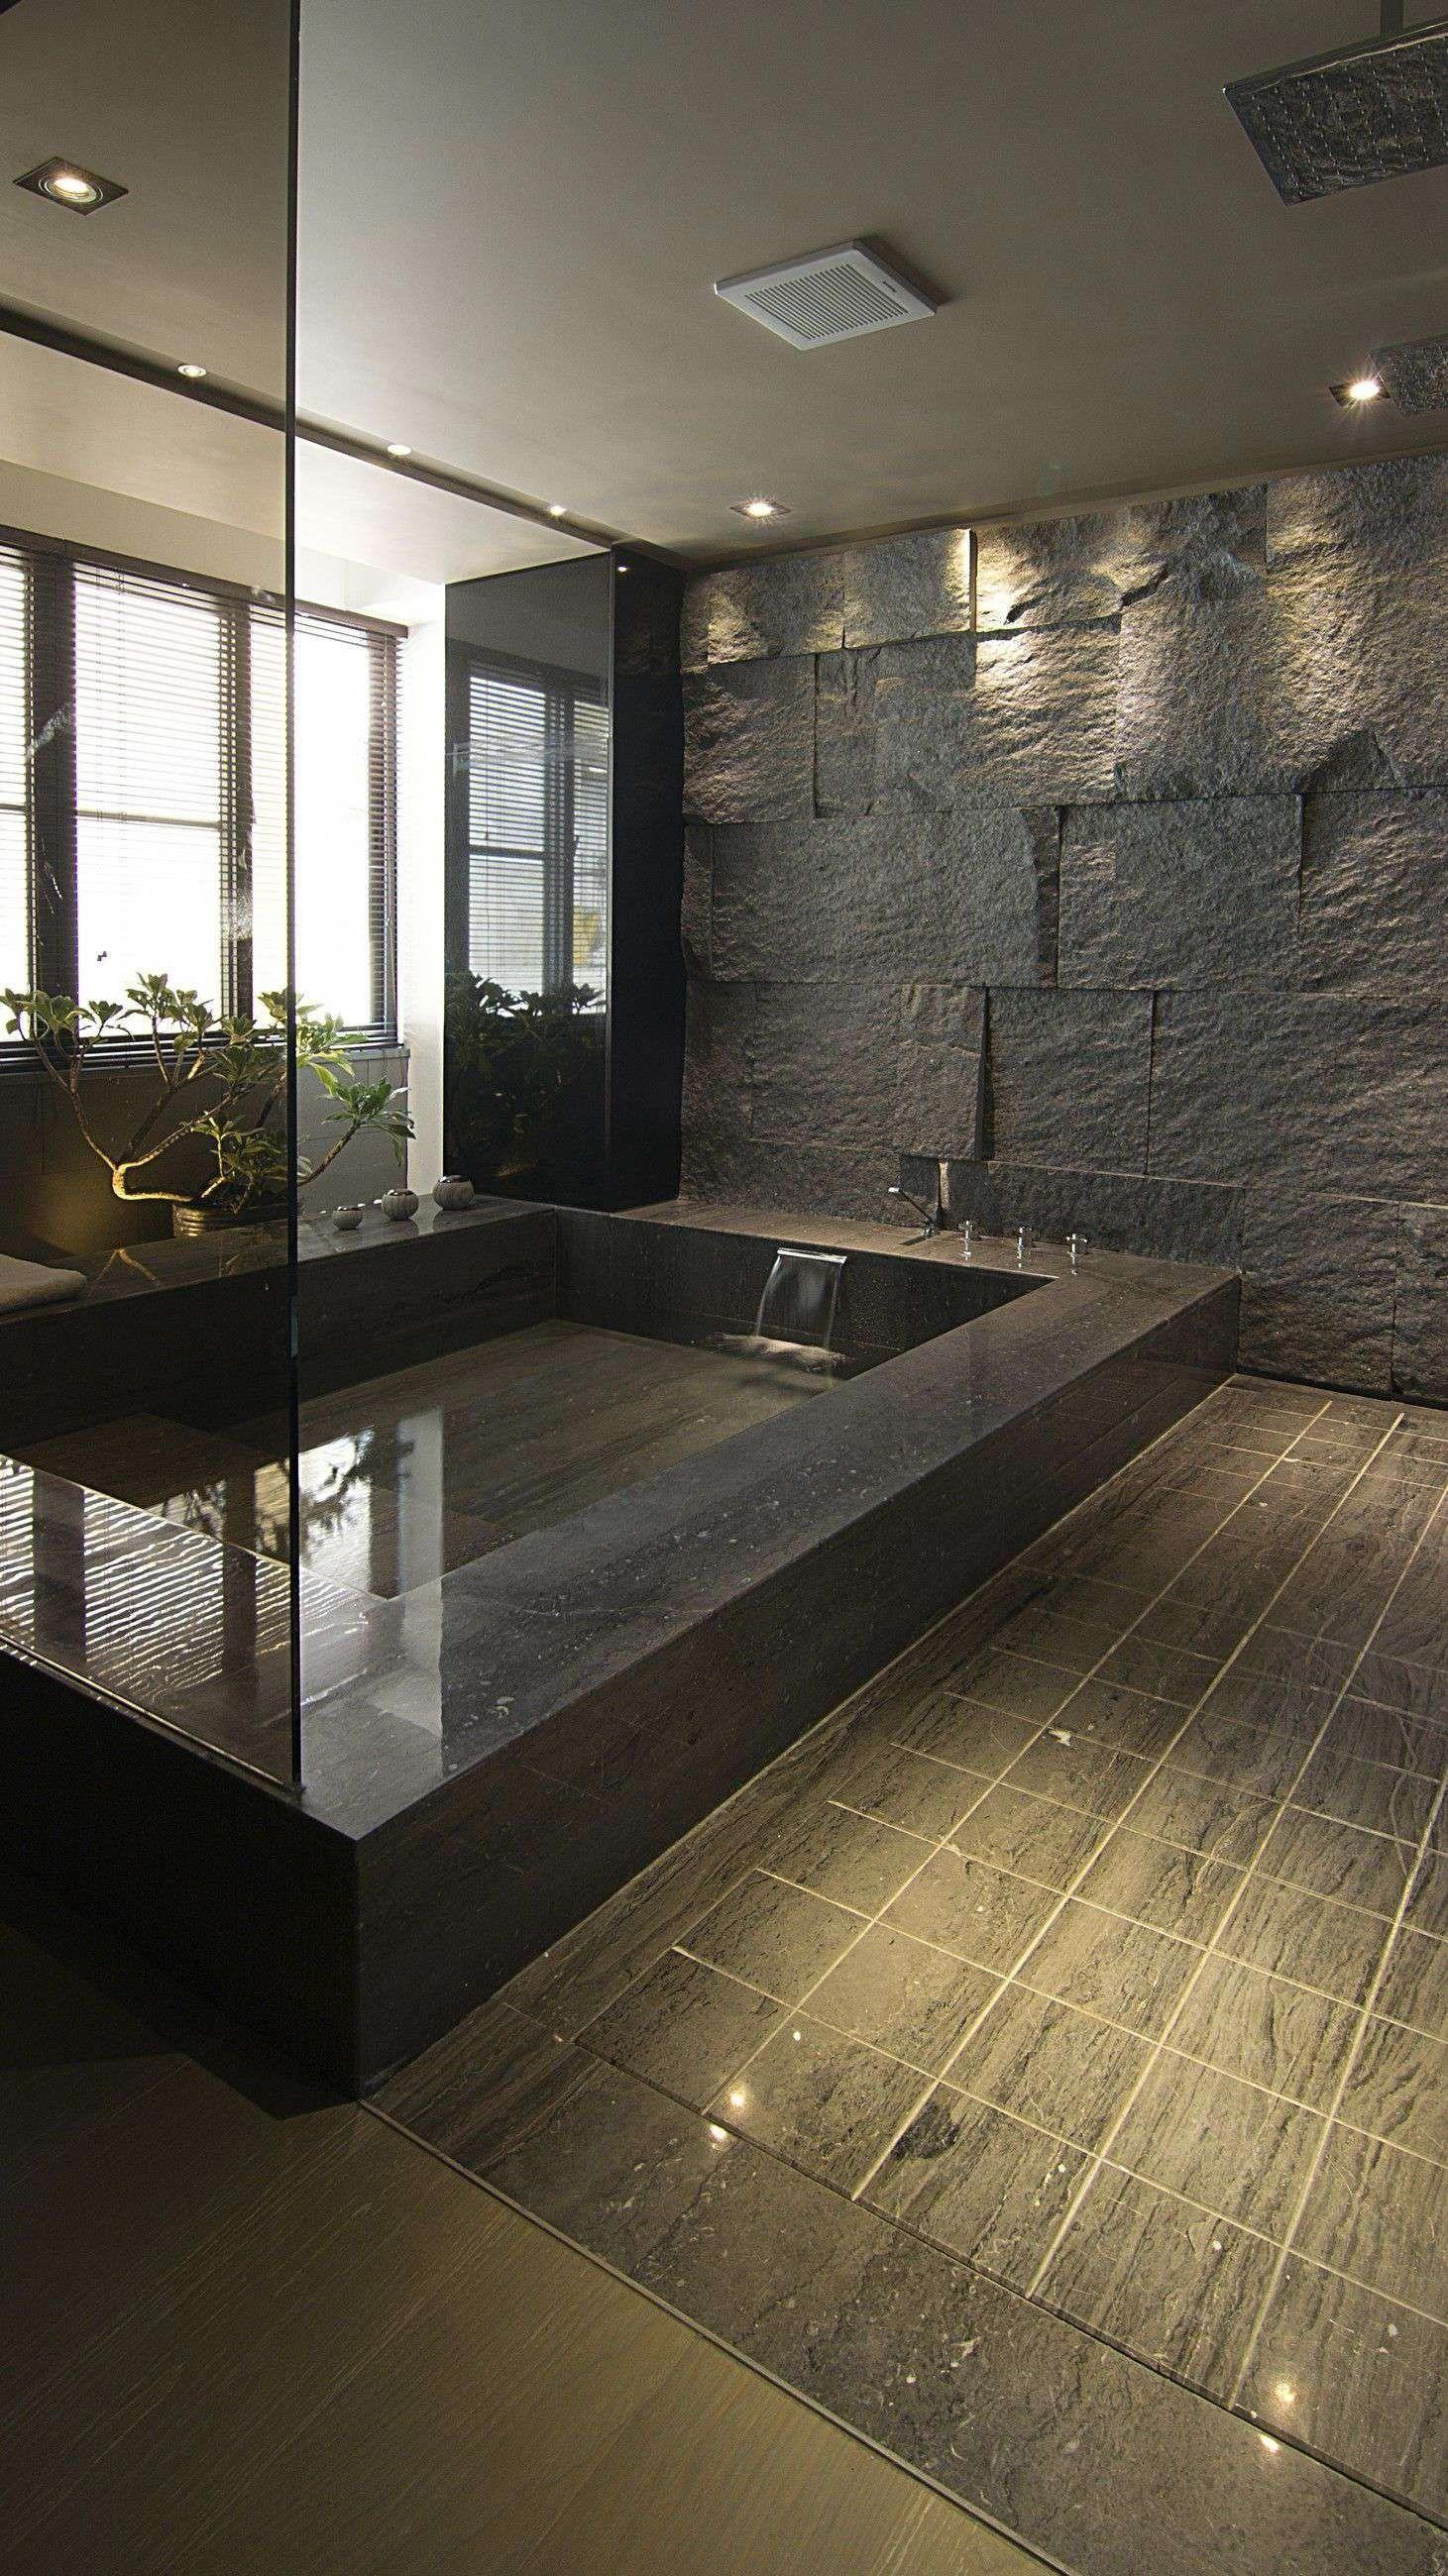 33 Wondrous Japanese Bathroom Ideas Bathroom Bathroomideas Bathroomdecor Dreambathroom Bathroom Design Luxury Bathroom Interior Design Dream Bathrooms Japanese bathroom design ideas